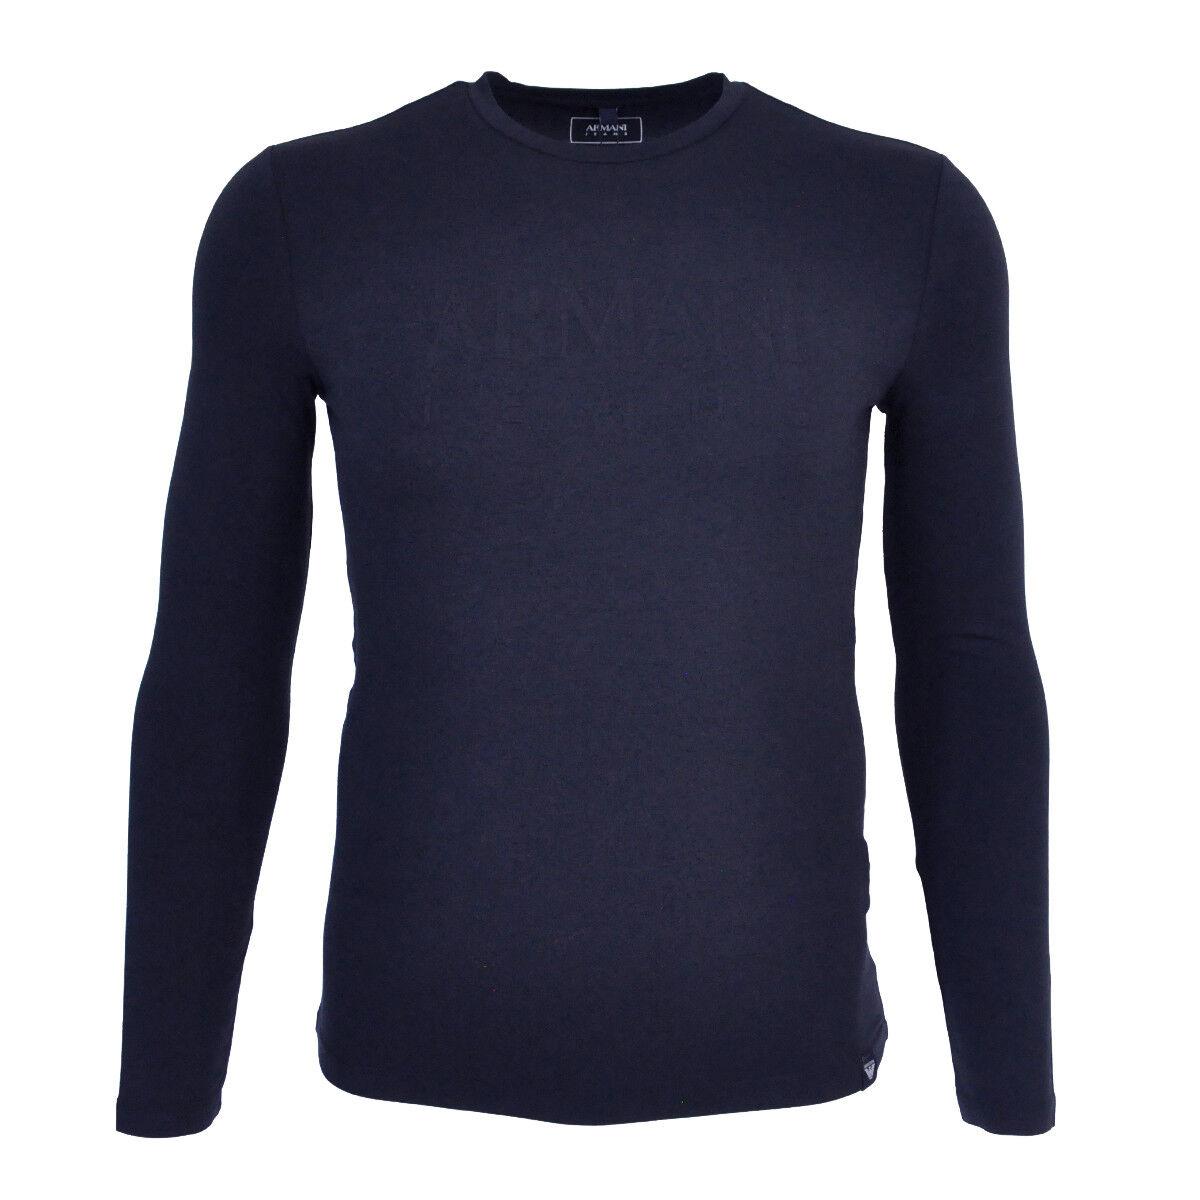 ARMANI JEANS Langarmshirt Shirt Aufdruck Logo Print 6Y6T74 6J0AZ Gr.S - 3XL 2018